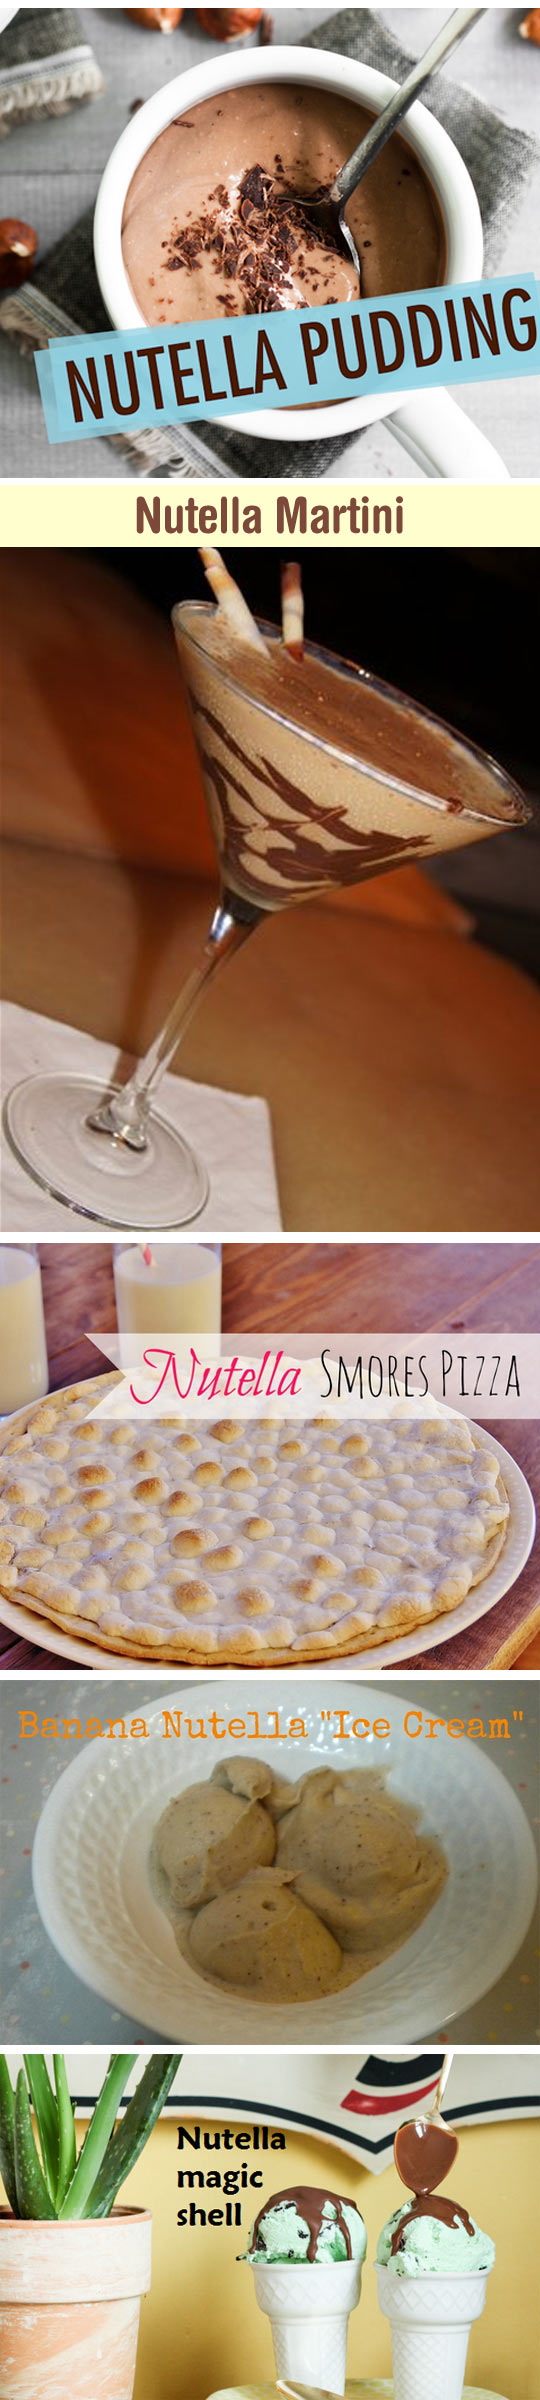 funny-Nutella-desserts-cooking-ice-cream